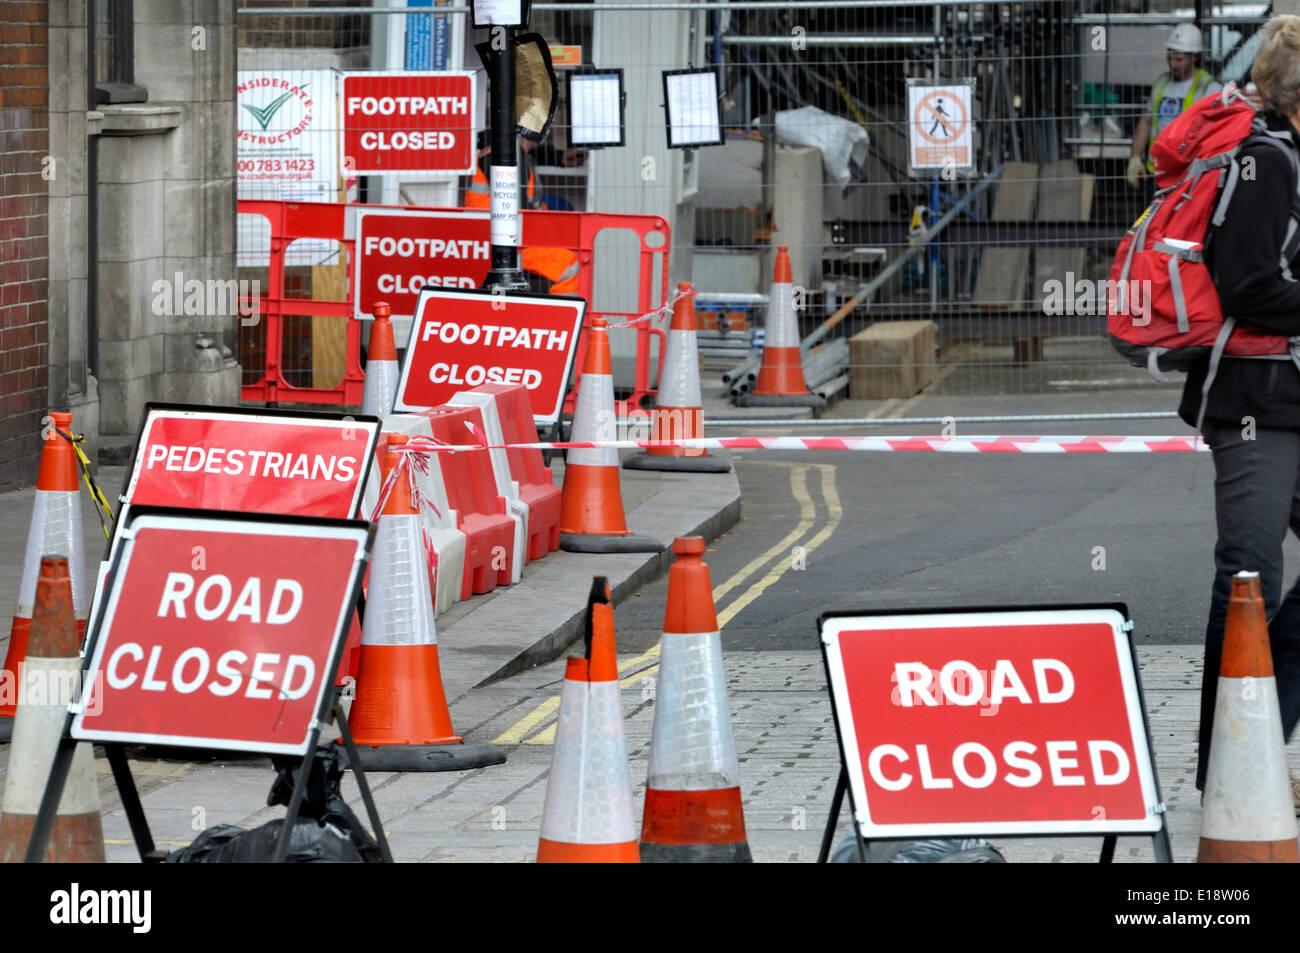 London, England, UK. Abundance of road signs - Road Closed / Footpath Closed - Stock Image